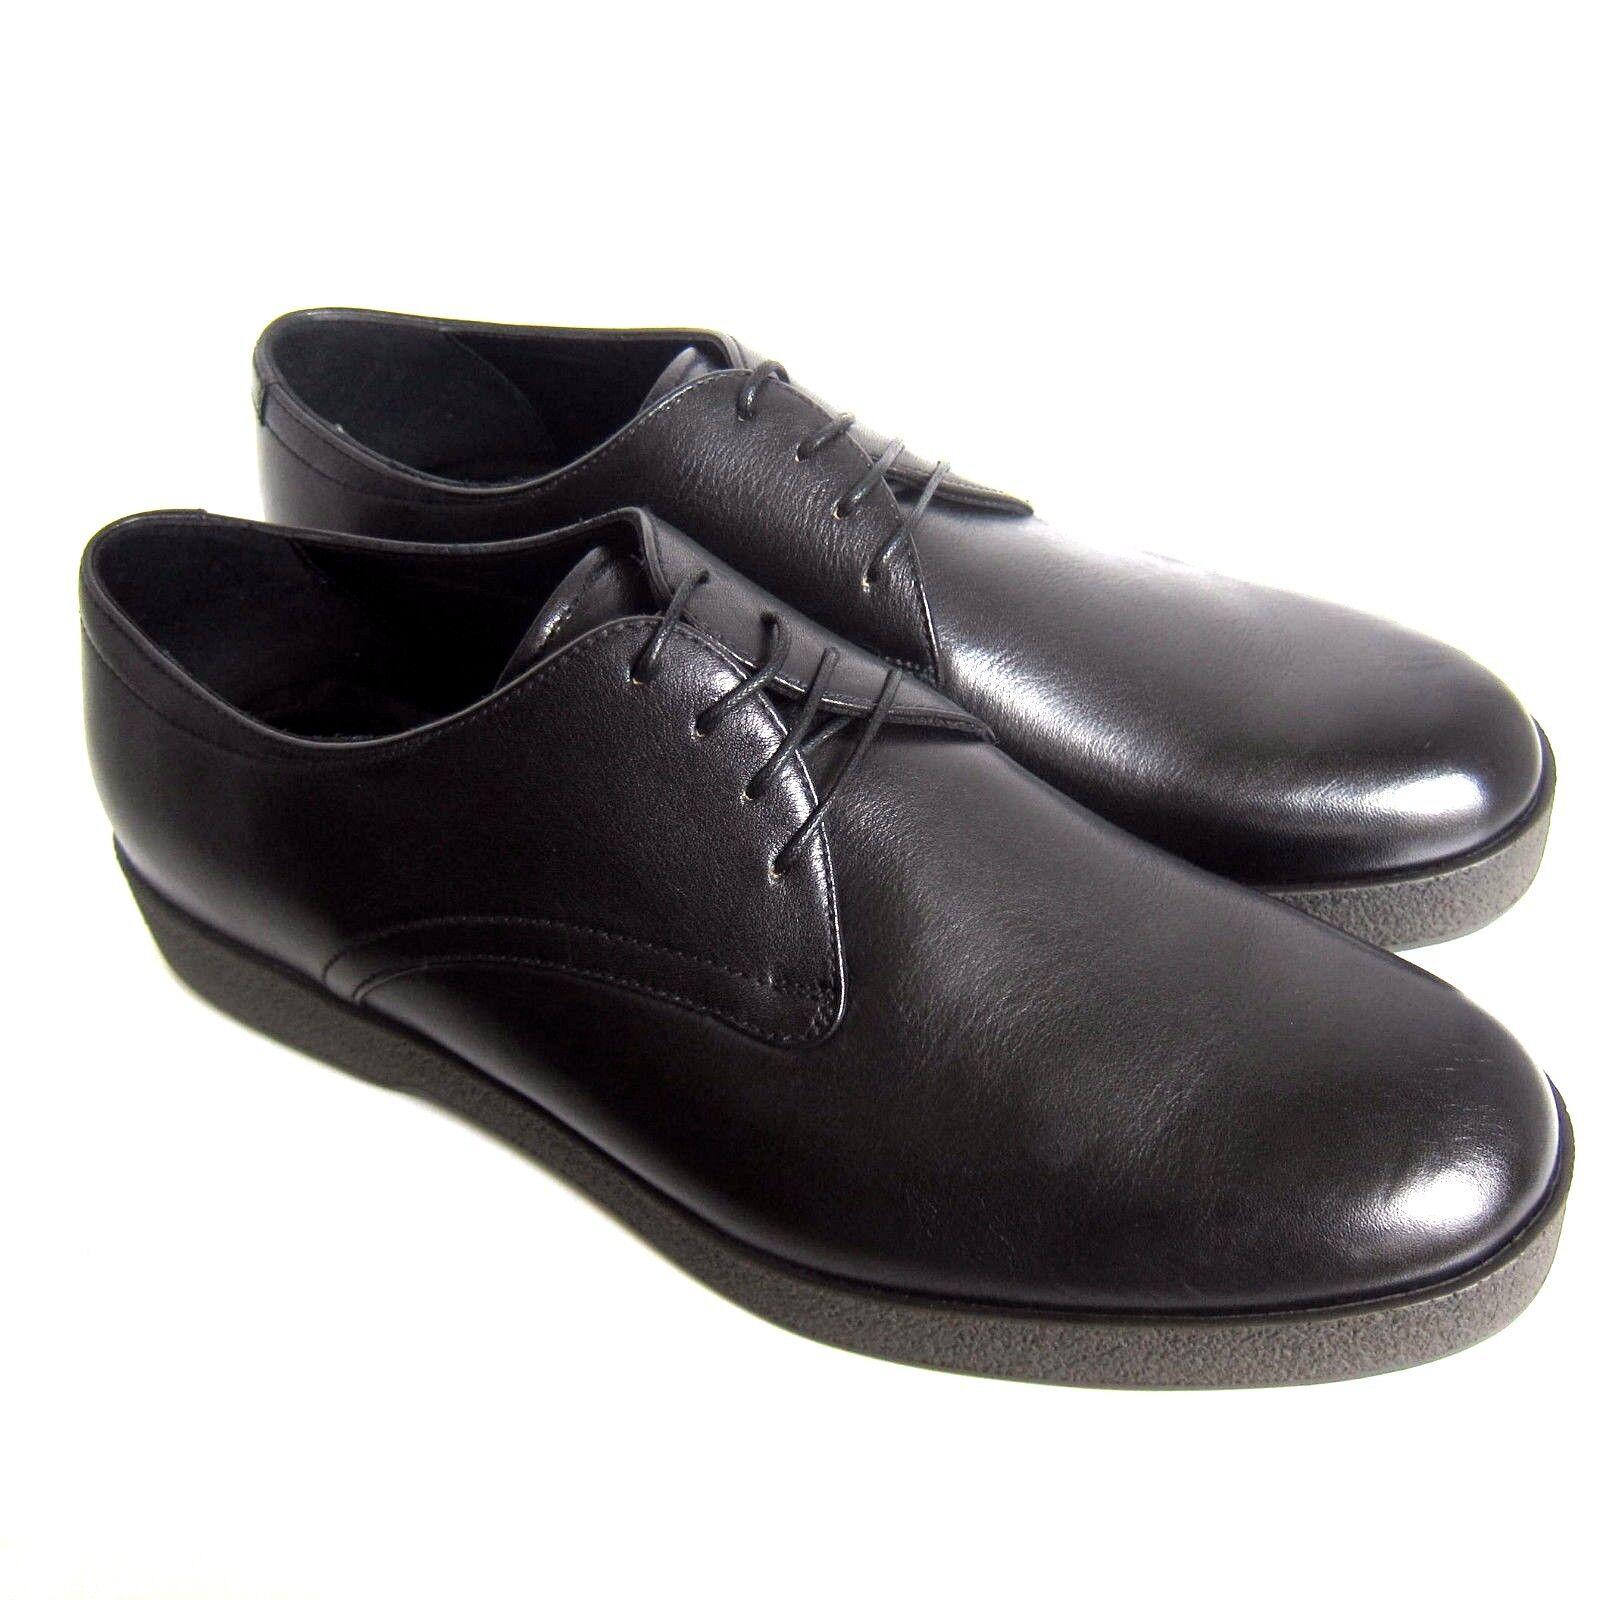 C-1365125 Neuf ErHommesegildo Zegna Cuir Chaussures à Lacets Taille US 10.5 D